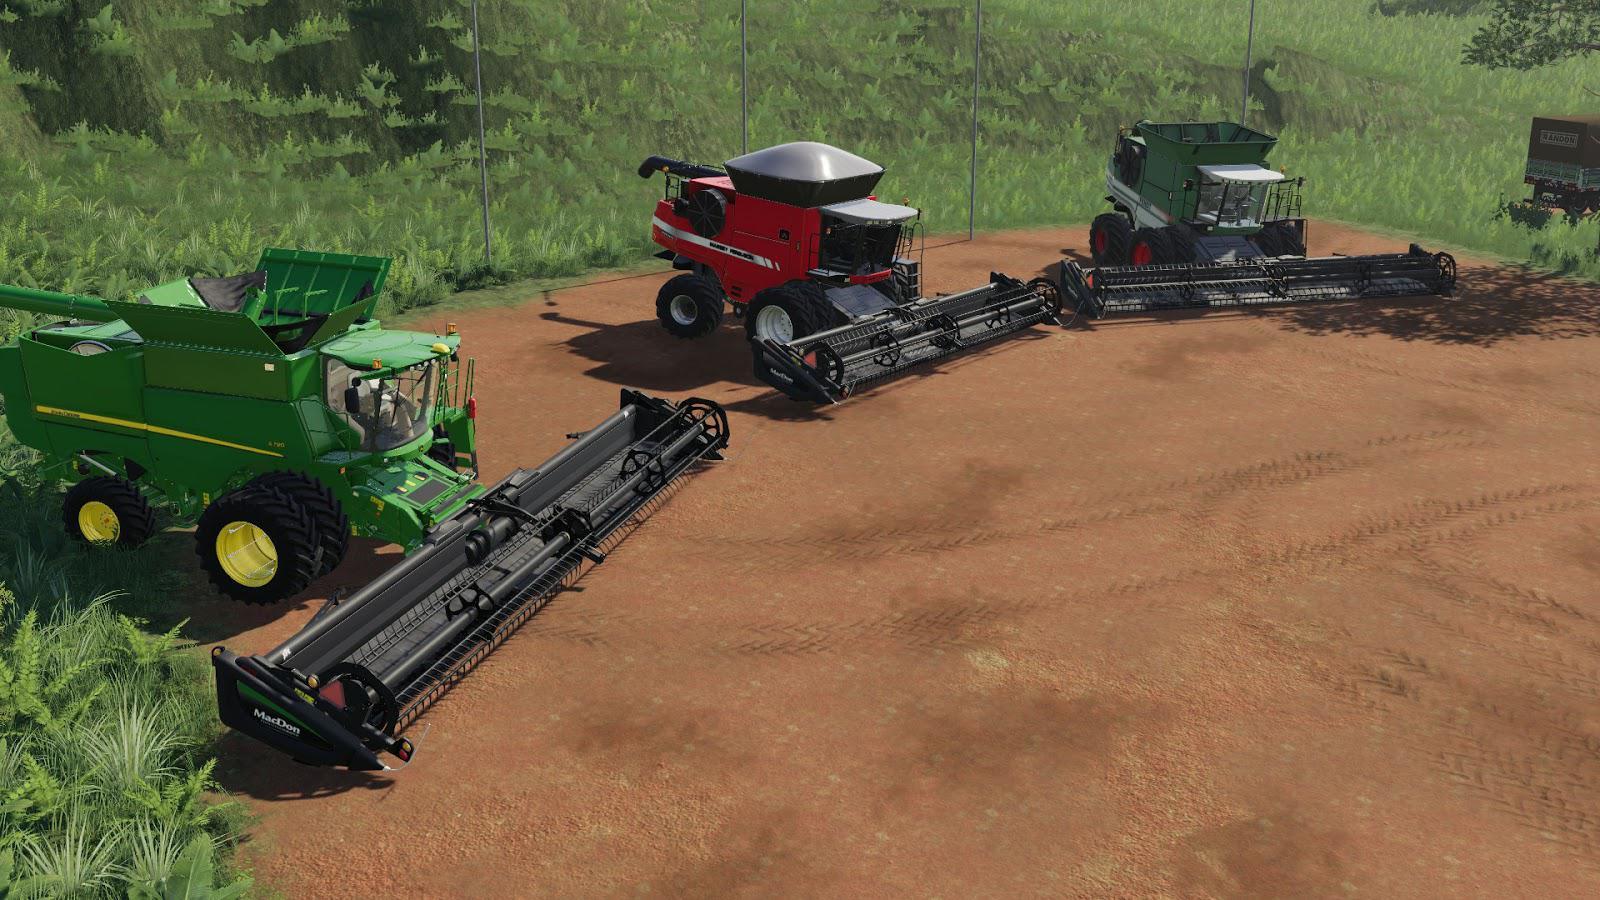 MACDON FD75 - 35, 40, 45 Pes v1 0 FS19 - Farming Simulator